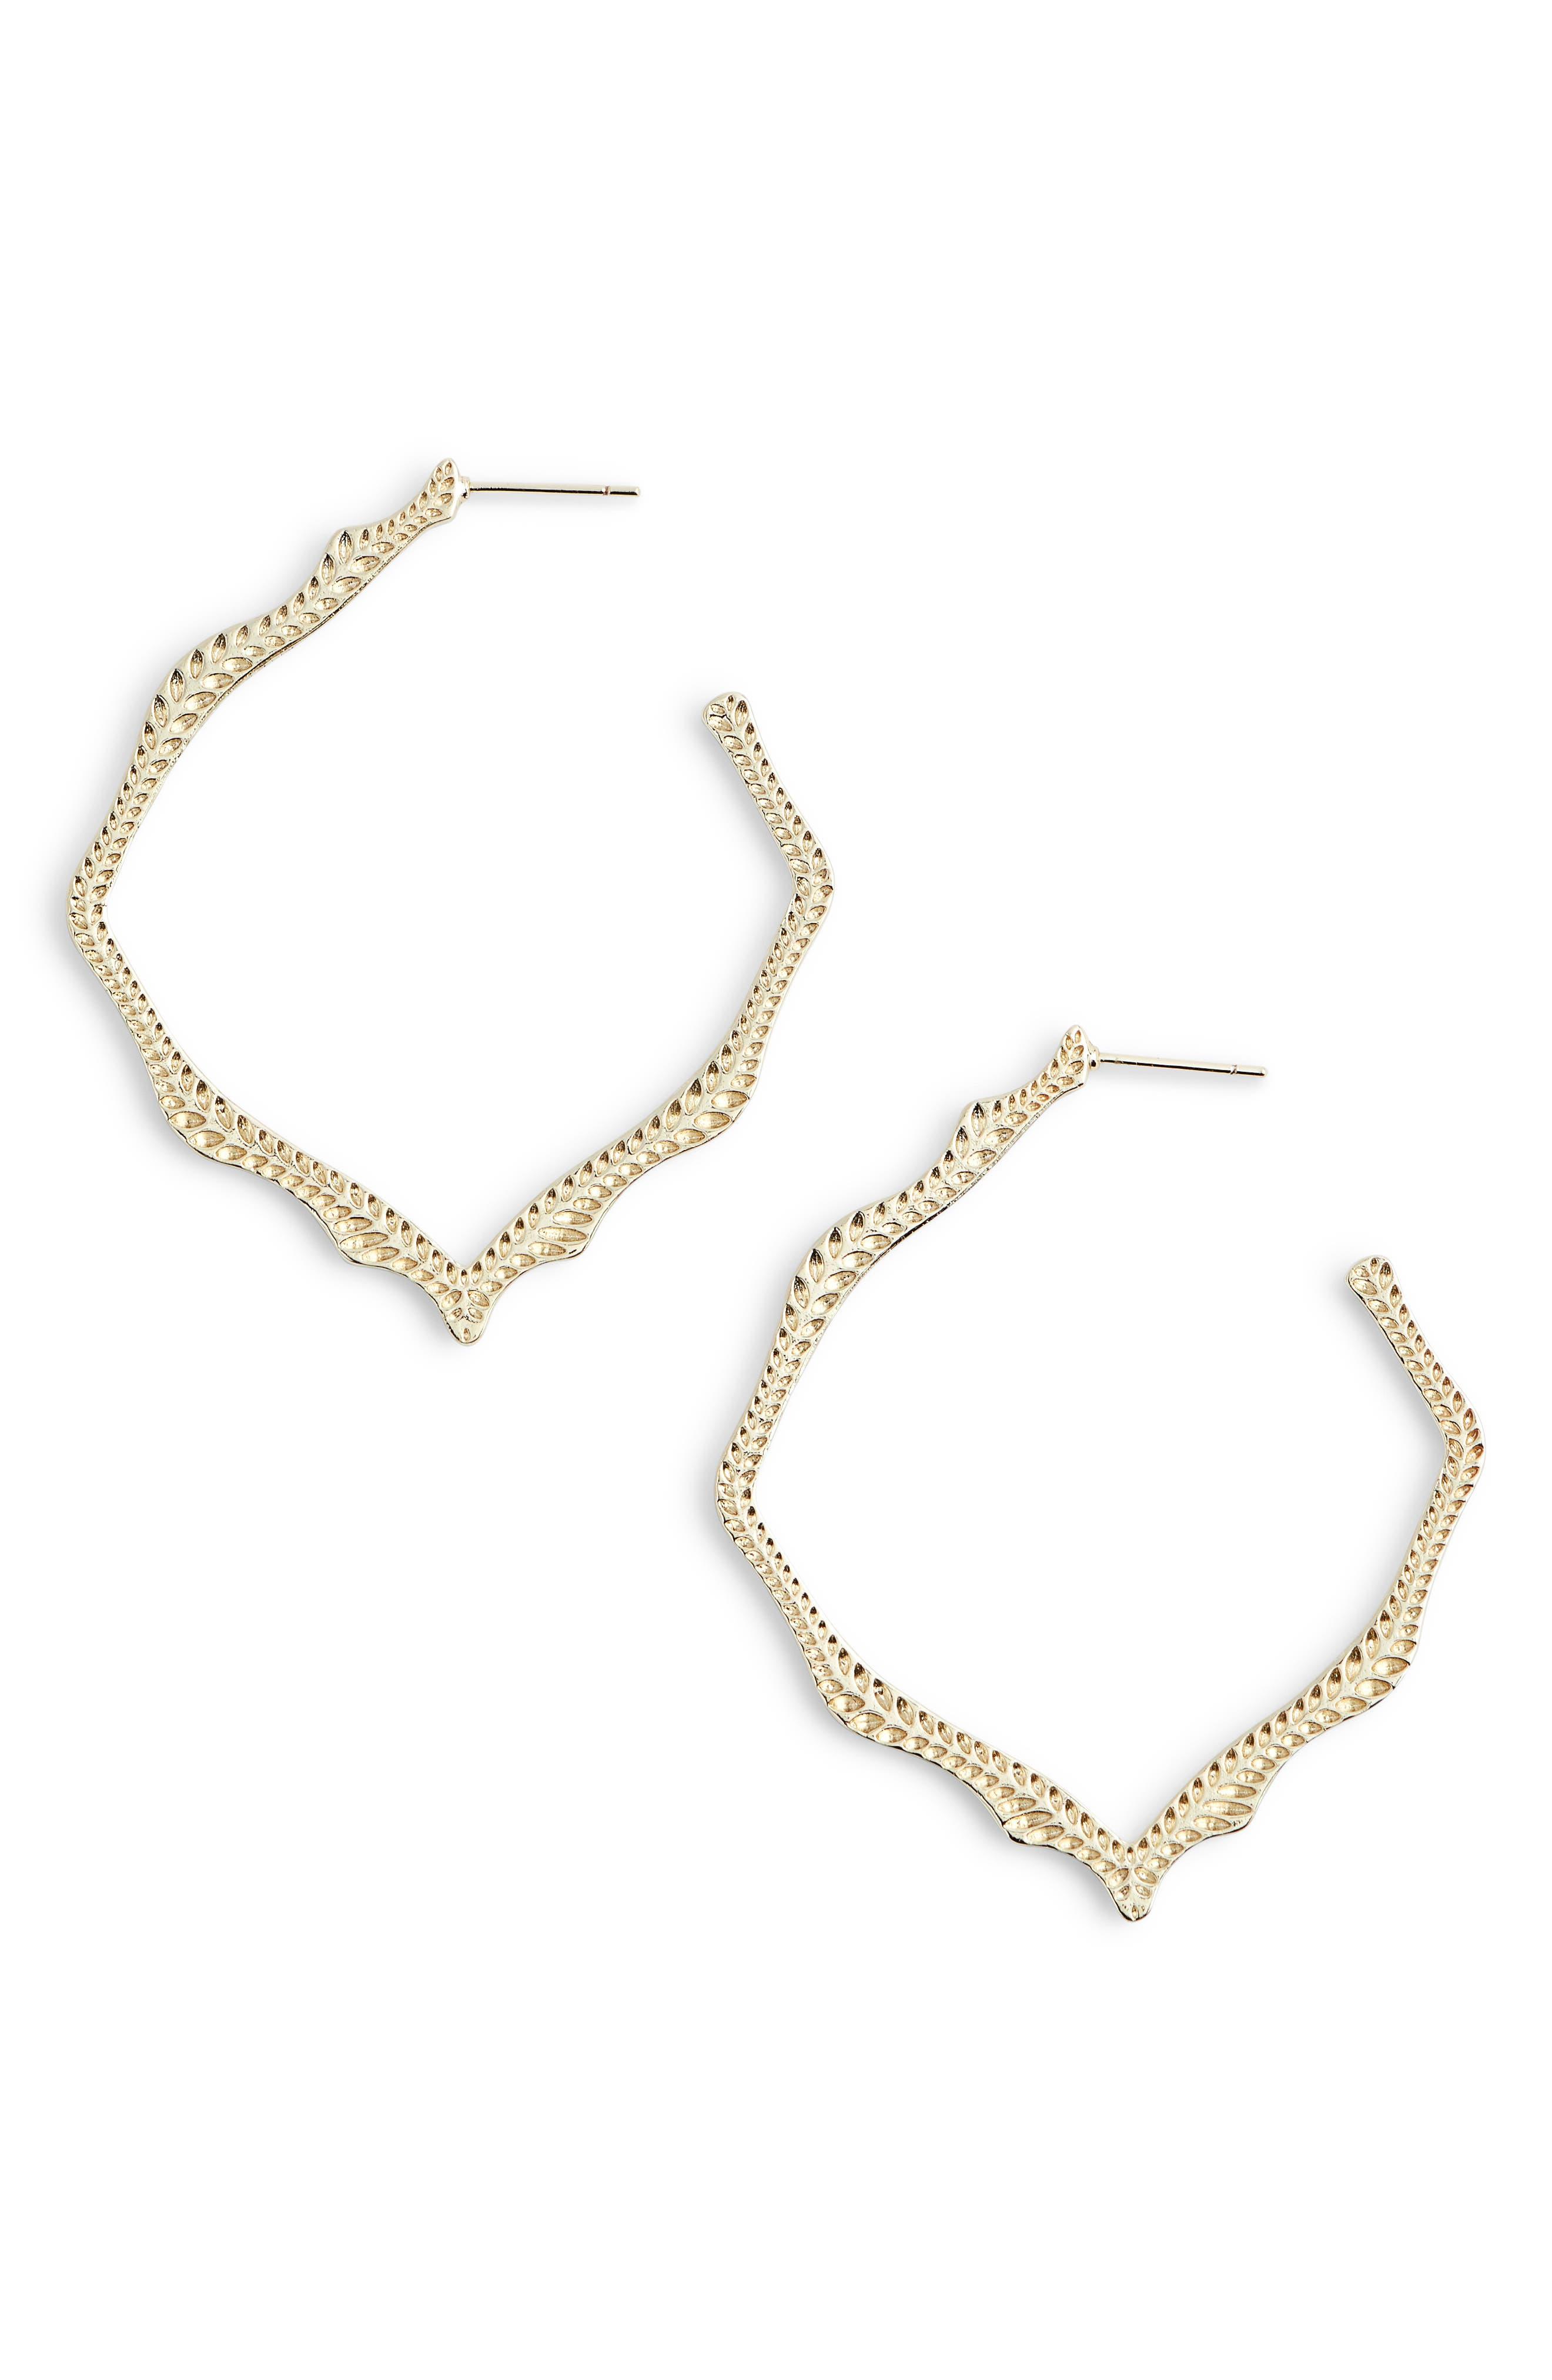 Miku Drop Earrings,                             Main thumbnail 1, color,                             GOLD